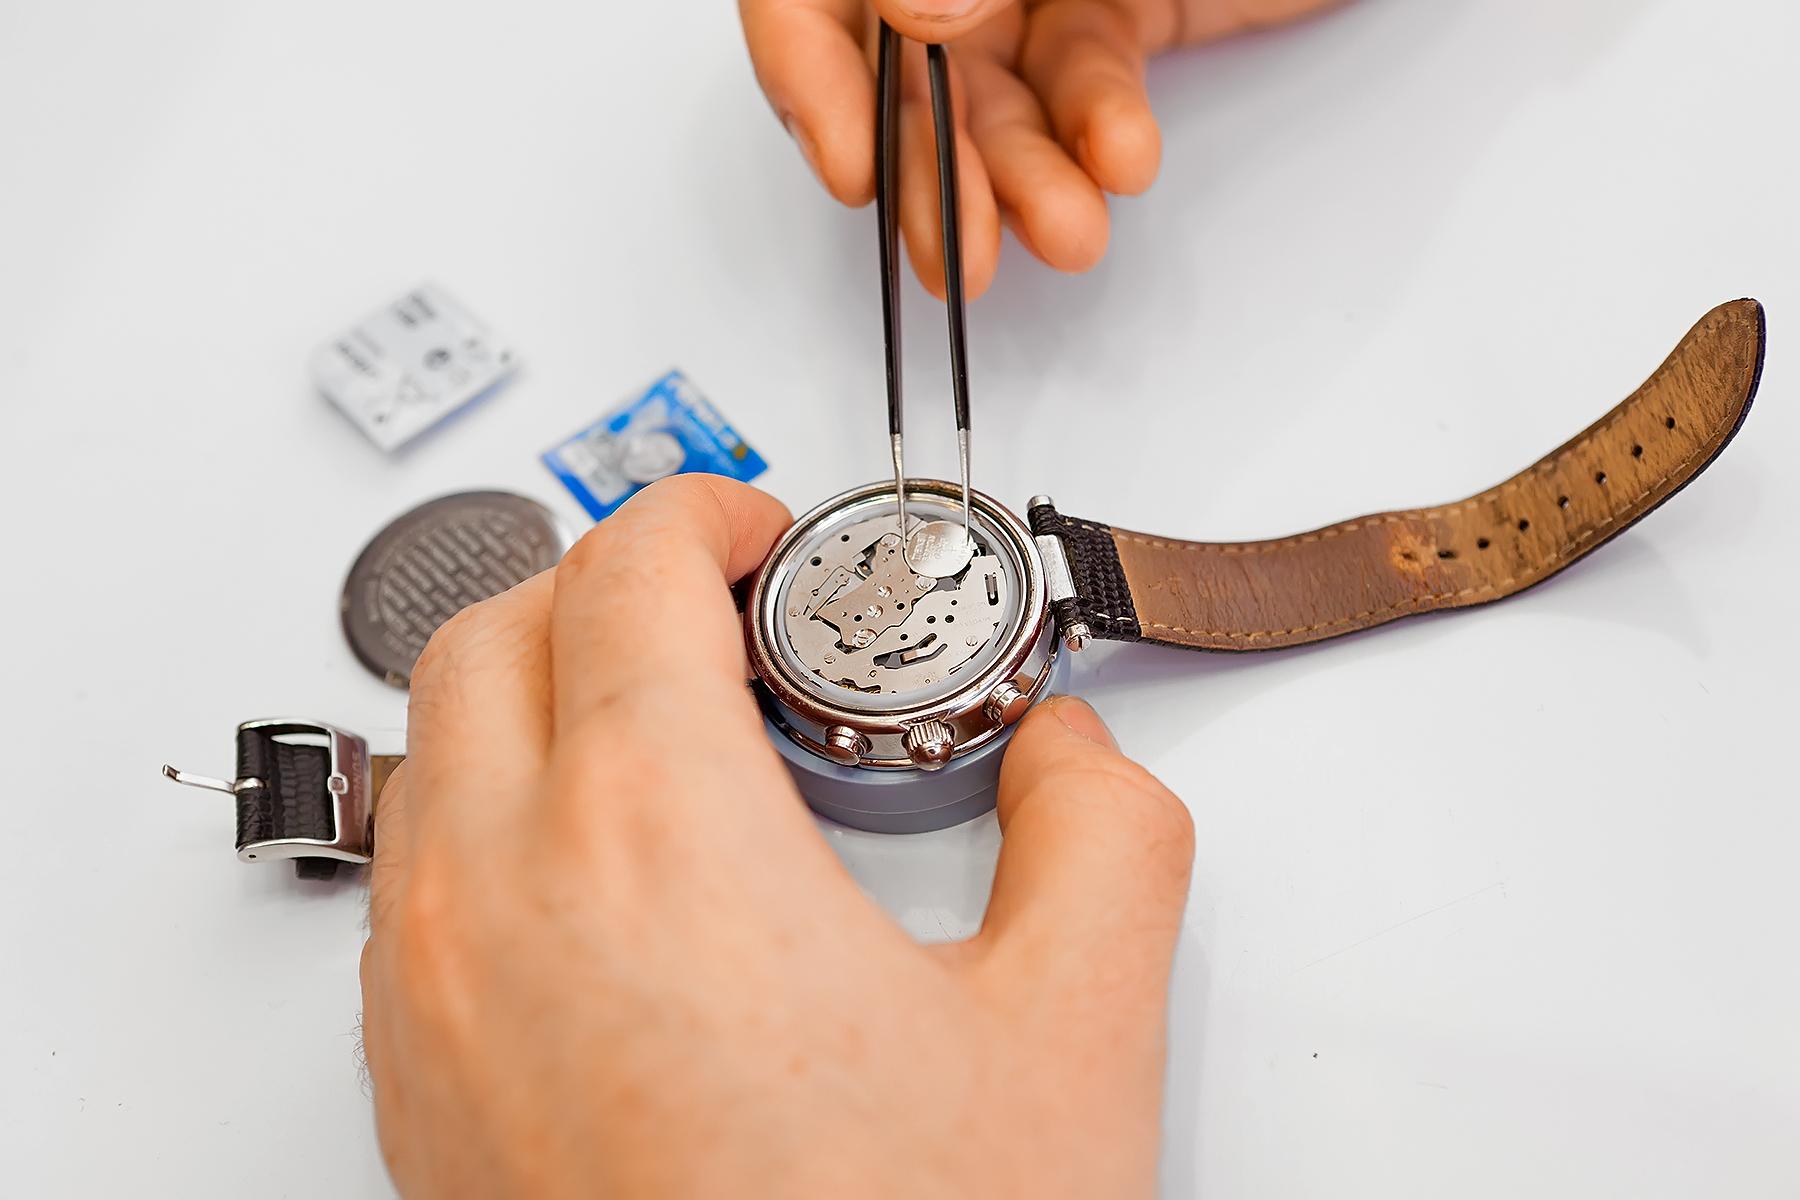 Как самой поменять ремешки на часах